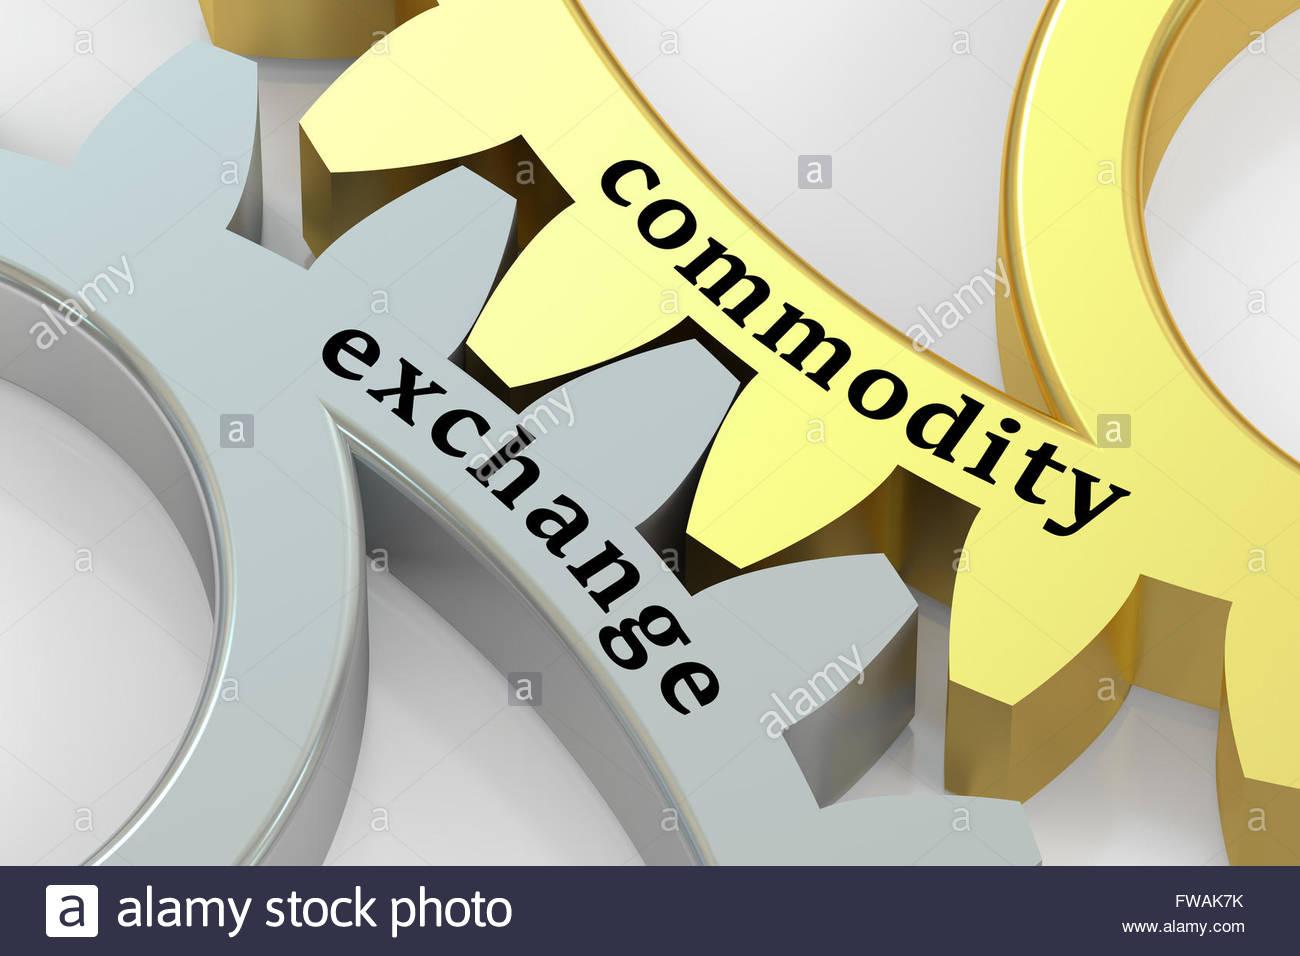 SEBON preparing to grant license for commodity exchange